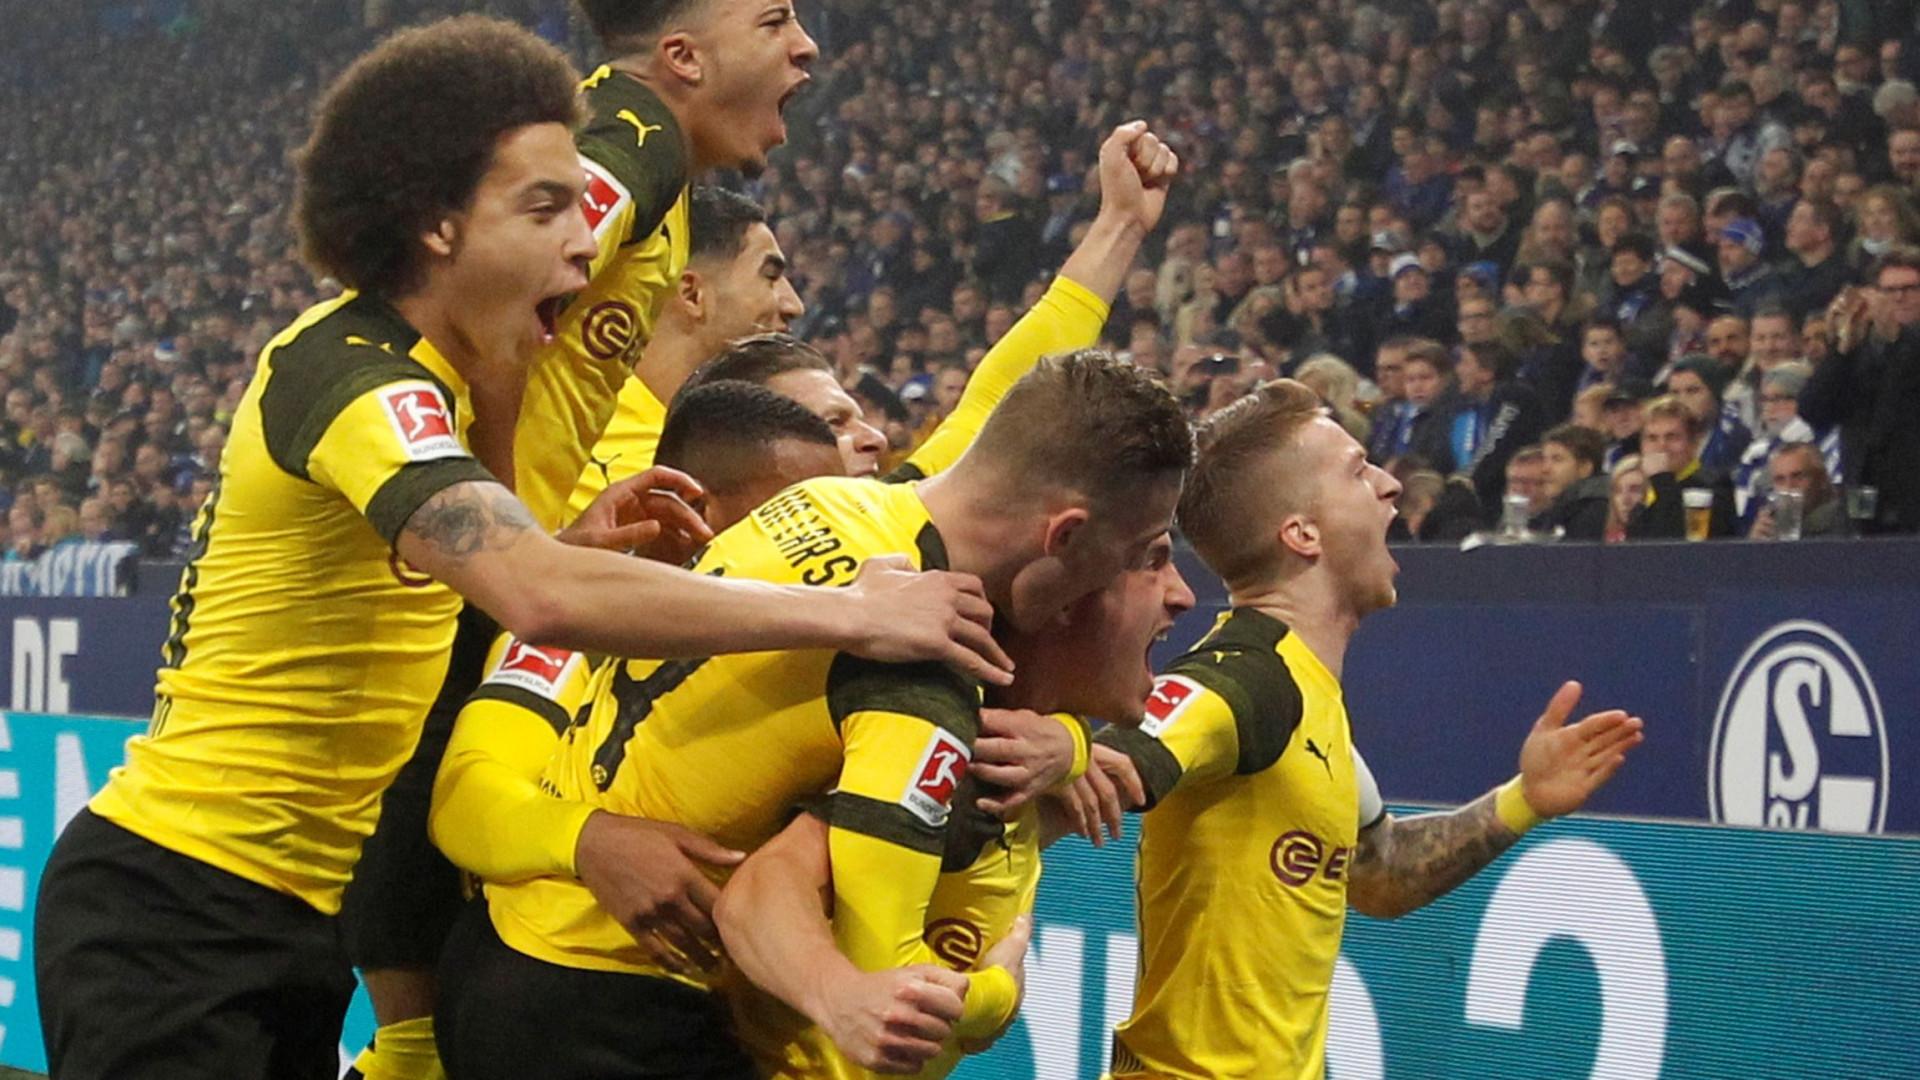 Líder Dortmund sofre mas vence Schalke 04, Bayern provisoriamente segundo